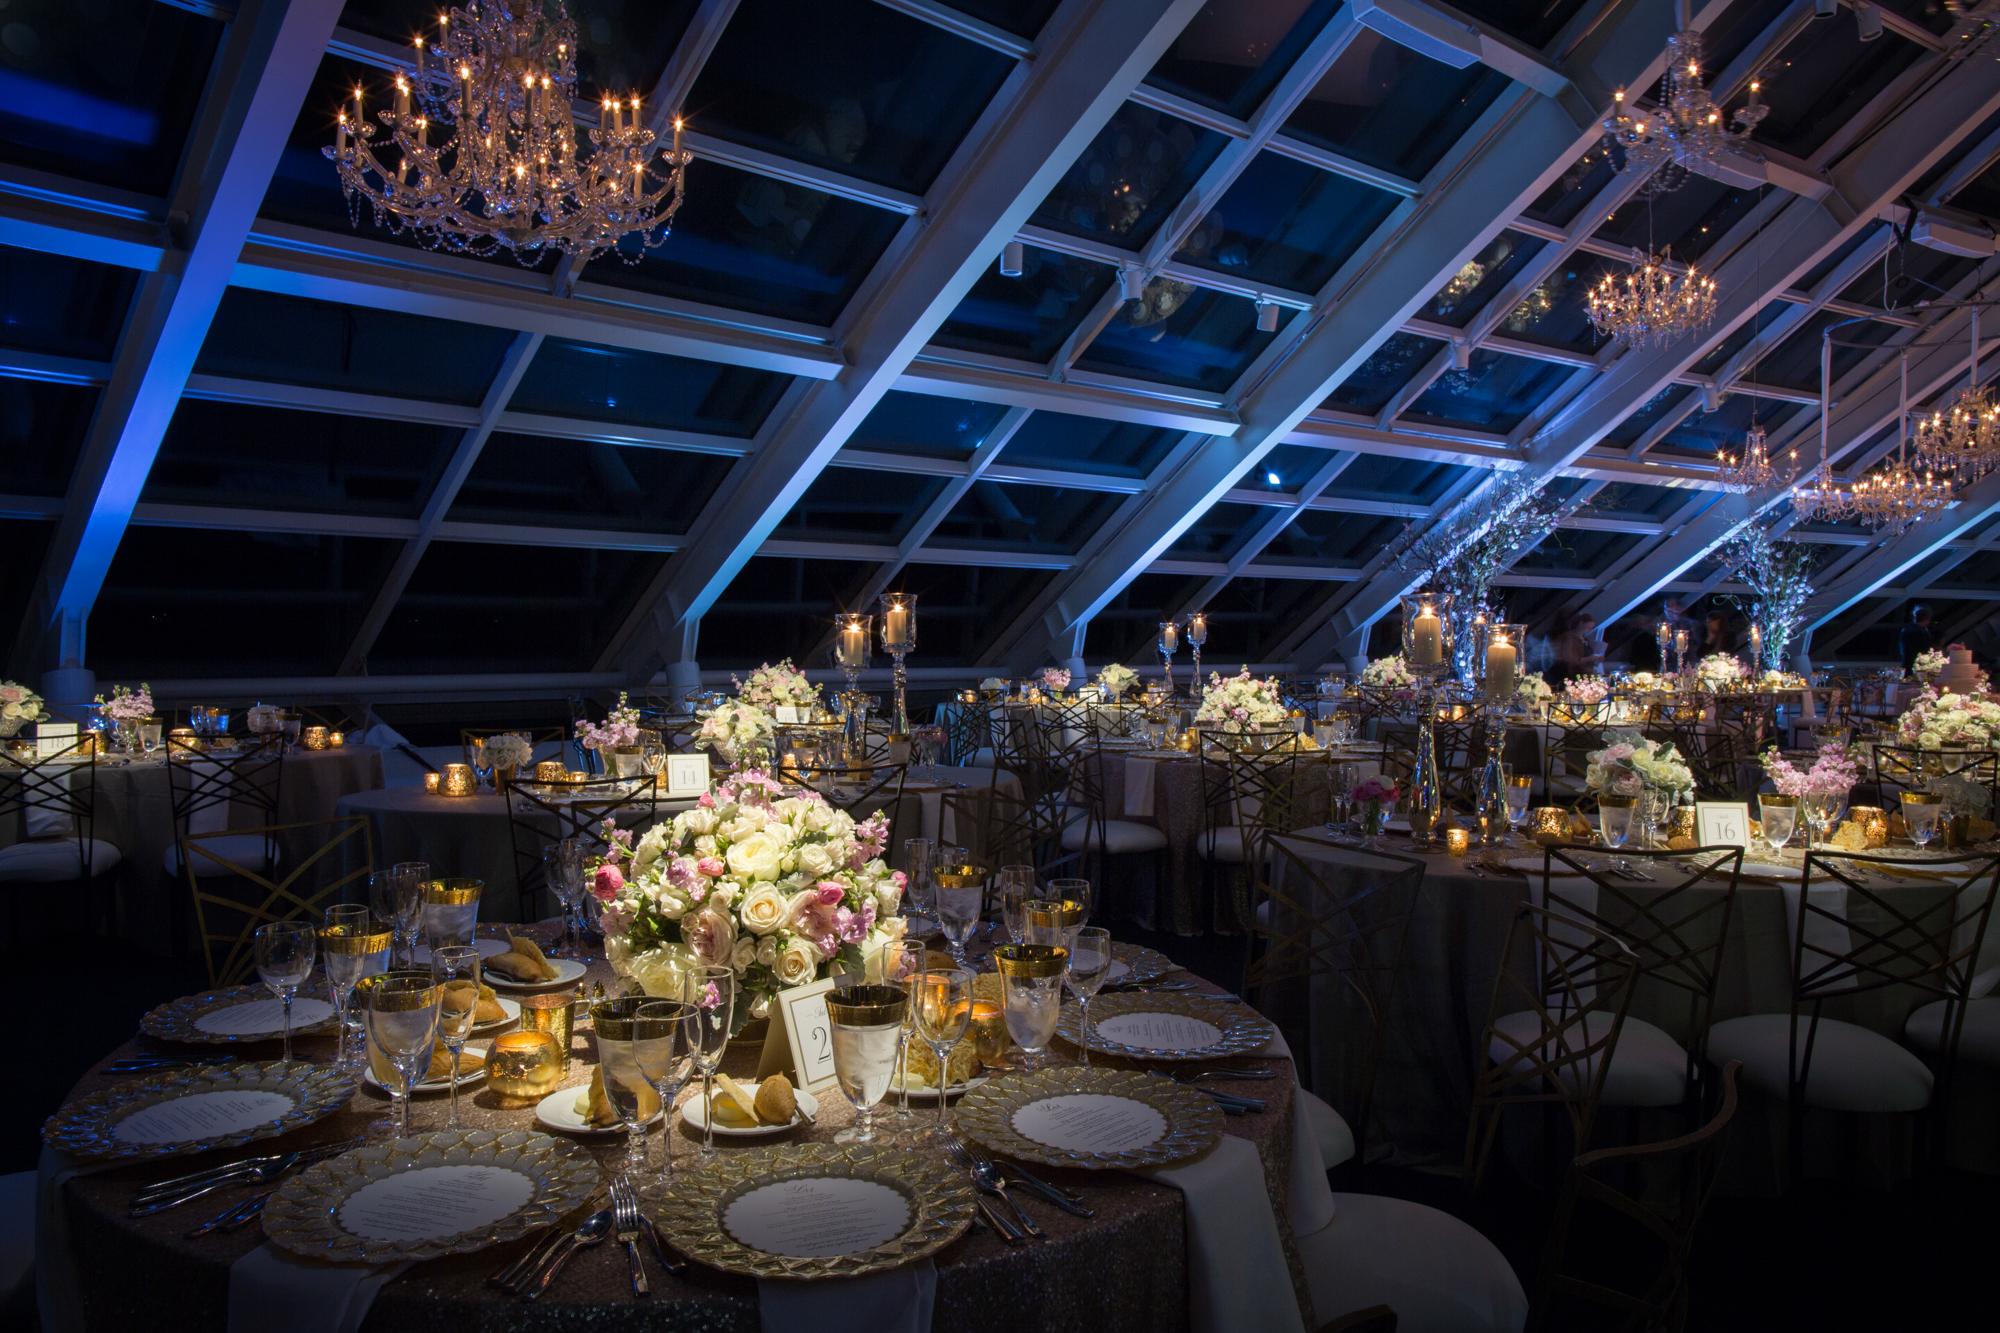 Stylish wedding reception at Adler Planetarium in Chicago.